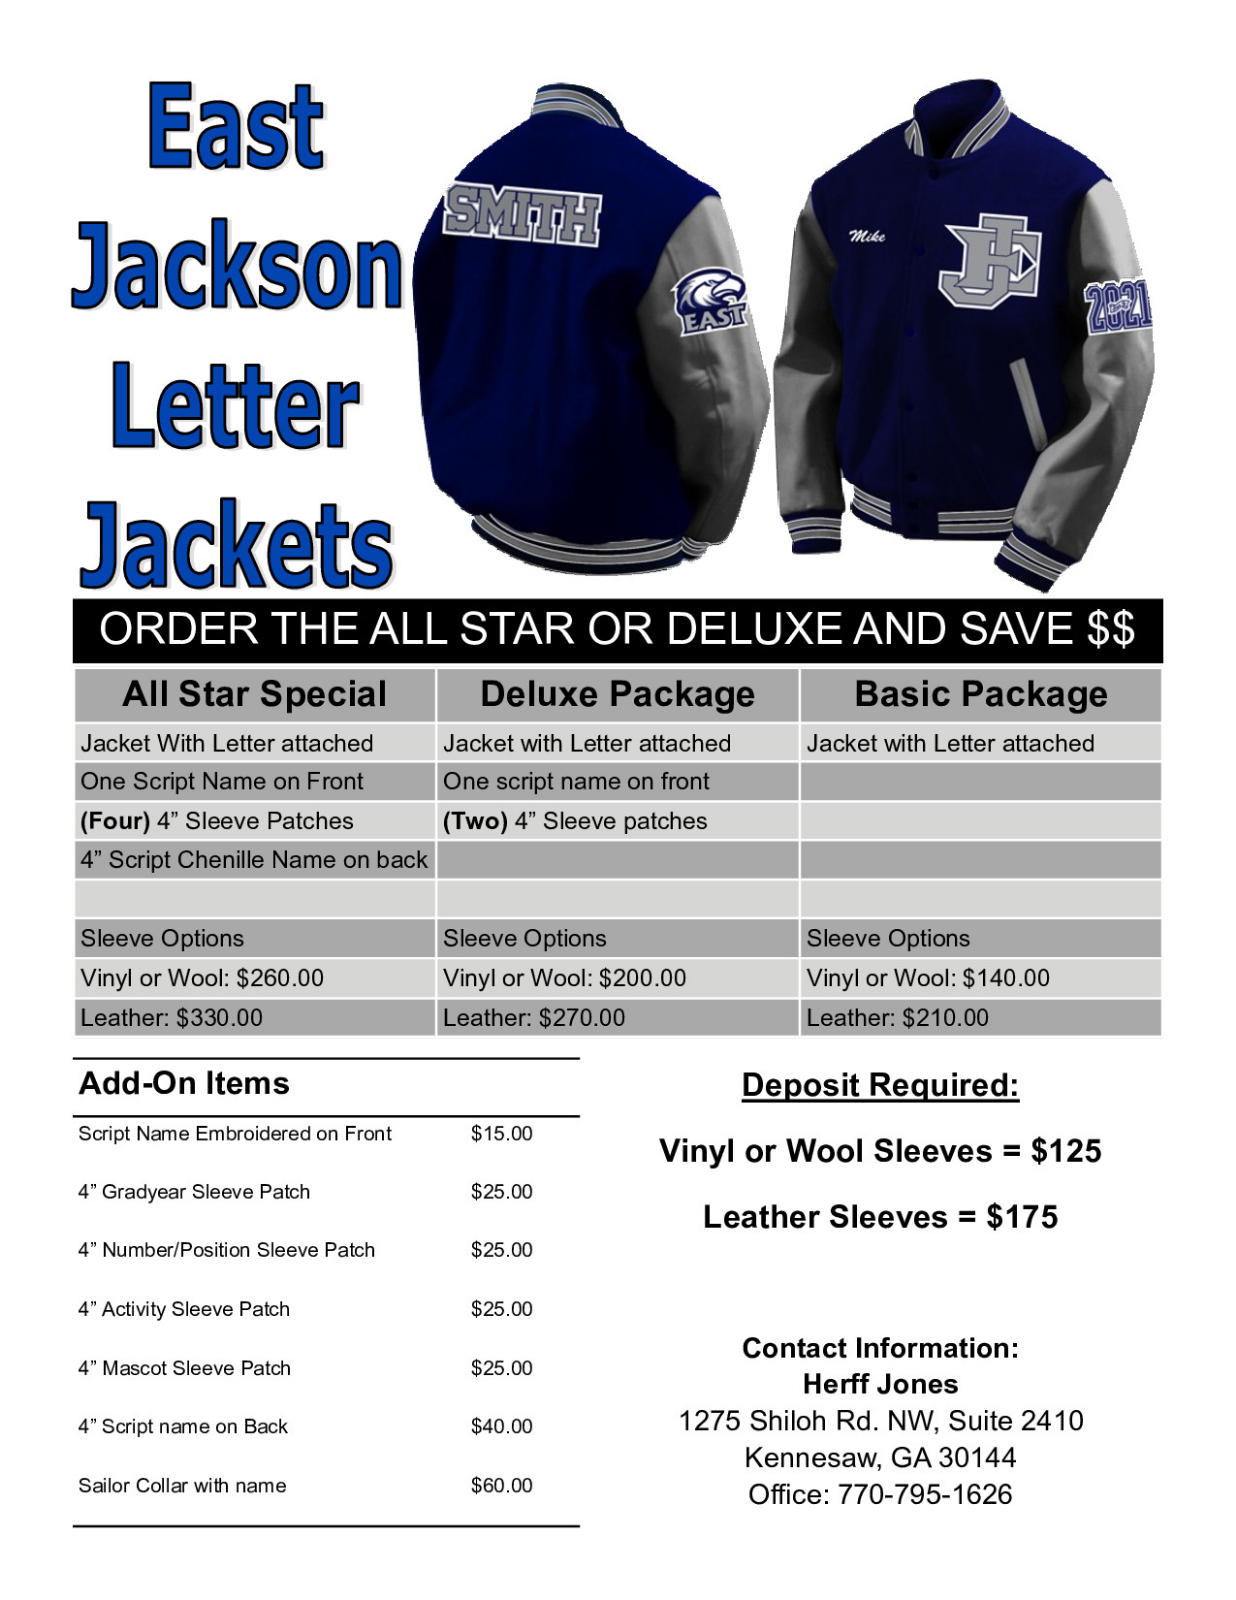 Herff Jones Letterman Jacket Rep 8/21